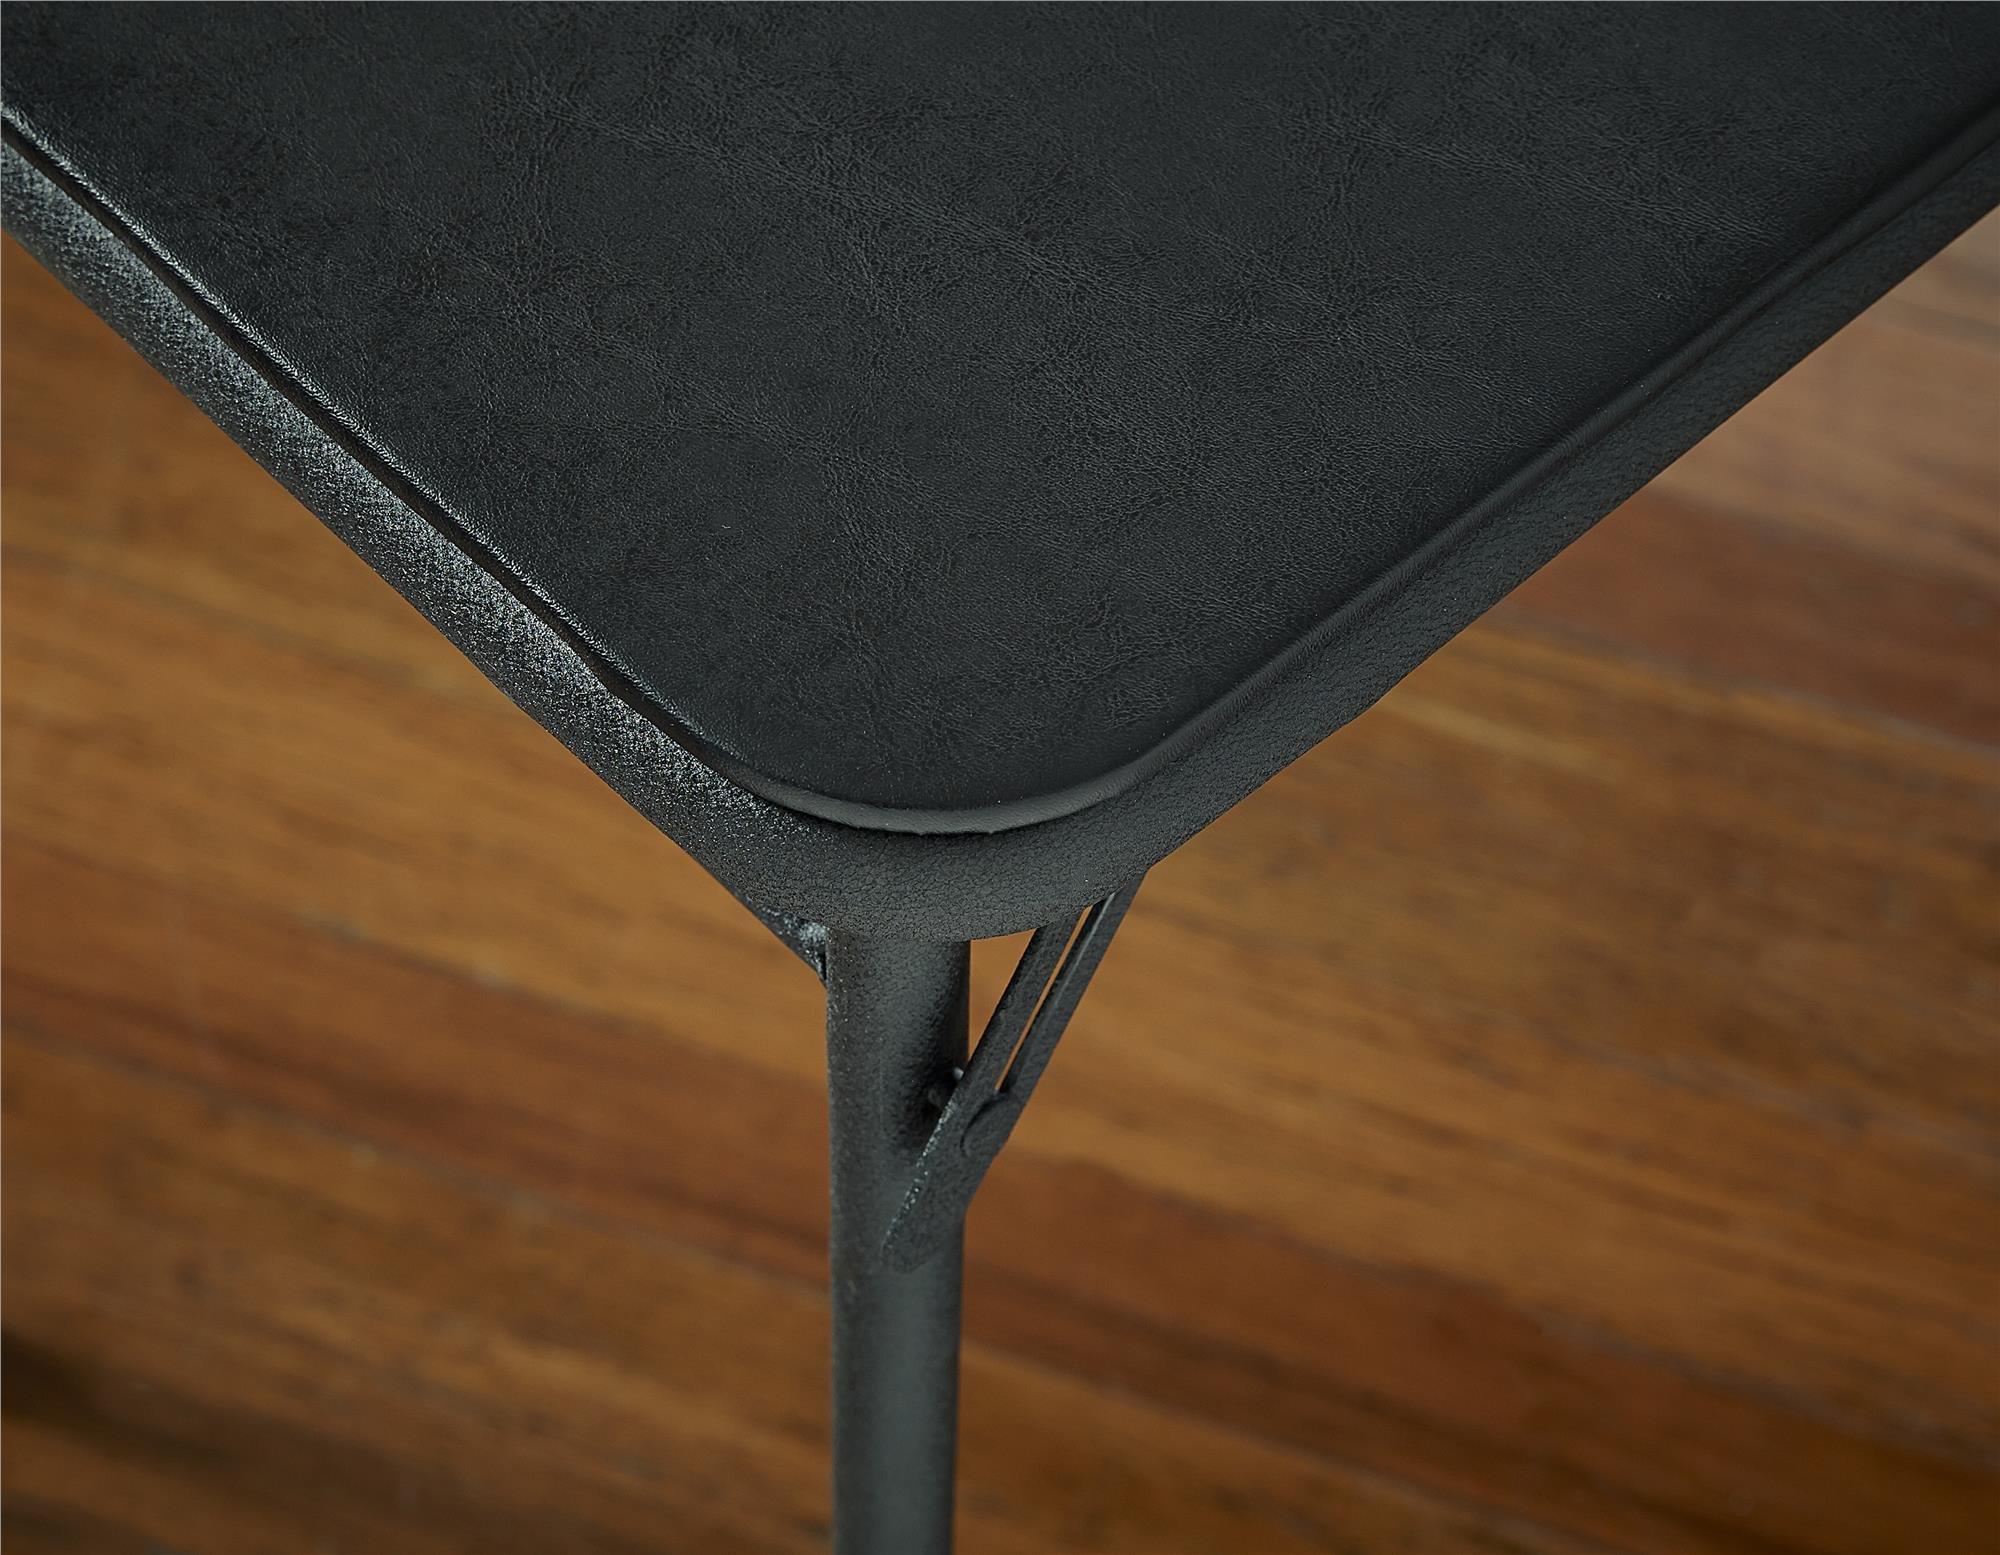 Cosco 20″ x 48″ Vinyl Top Folding Table